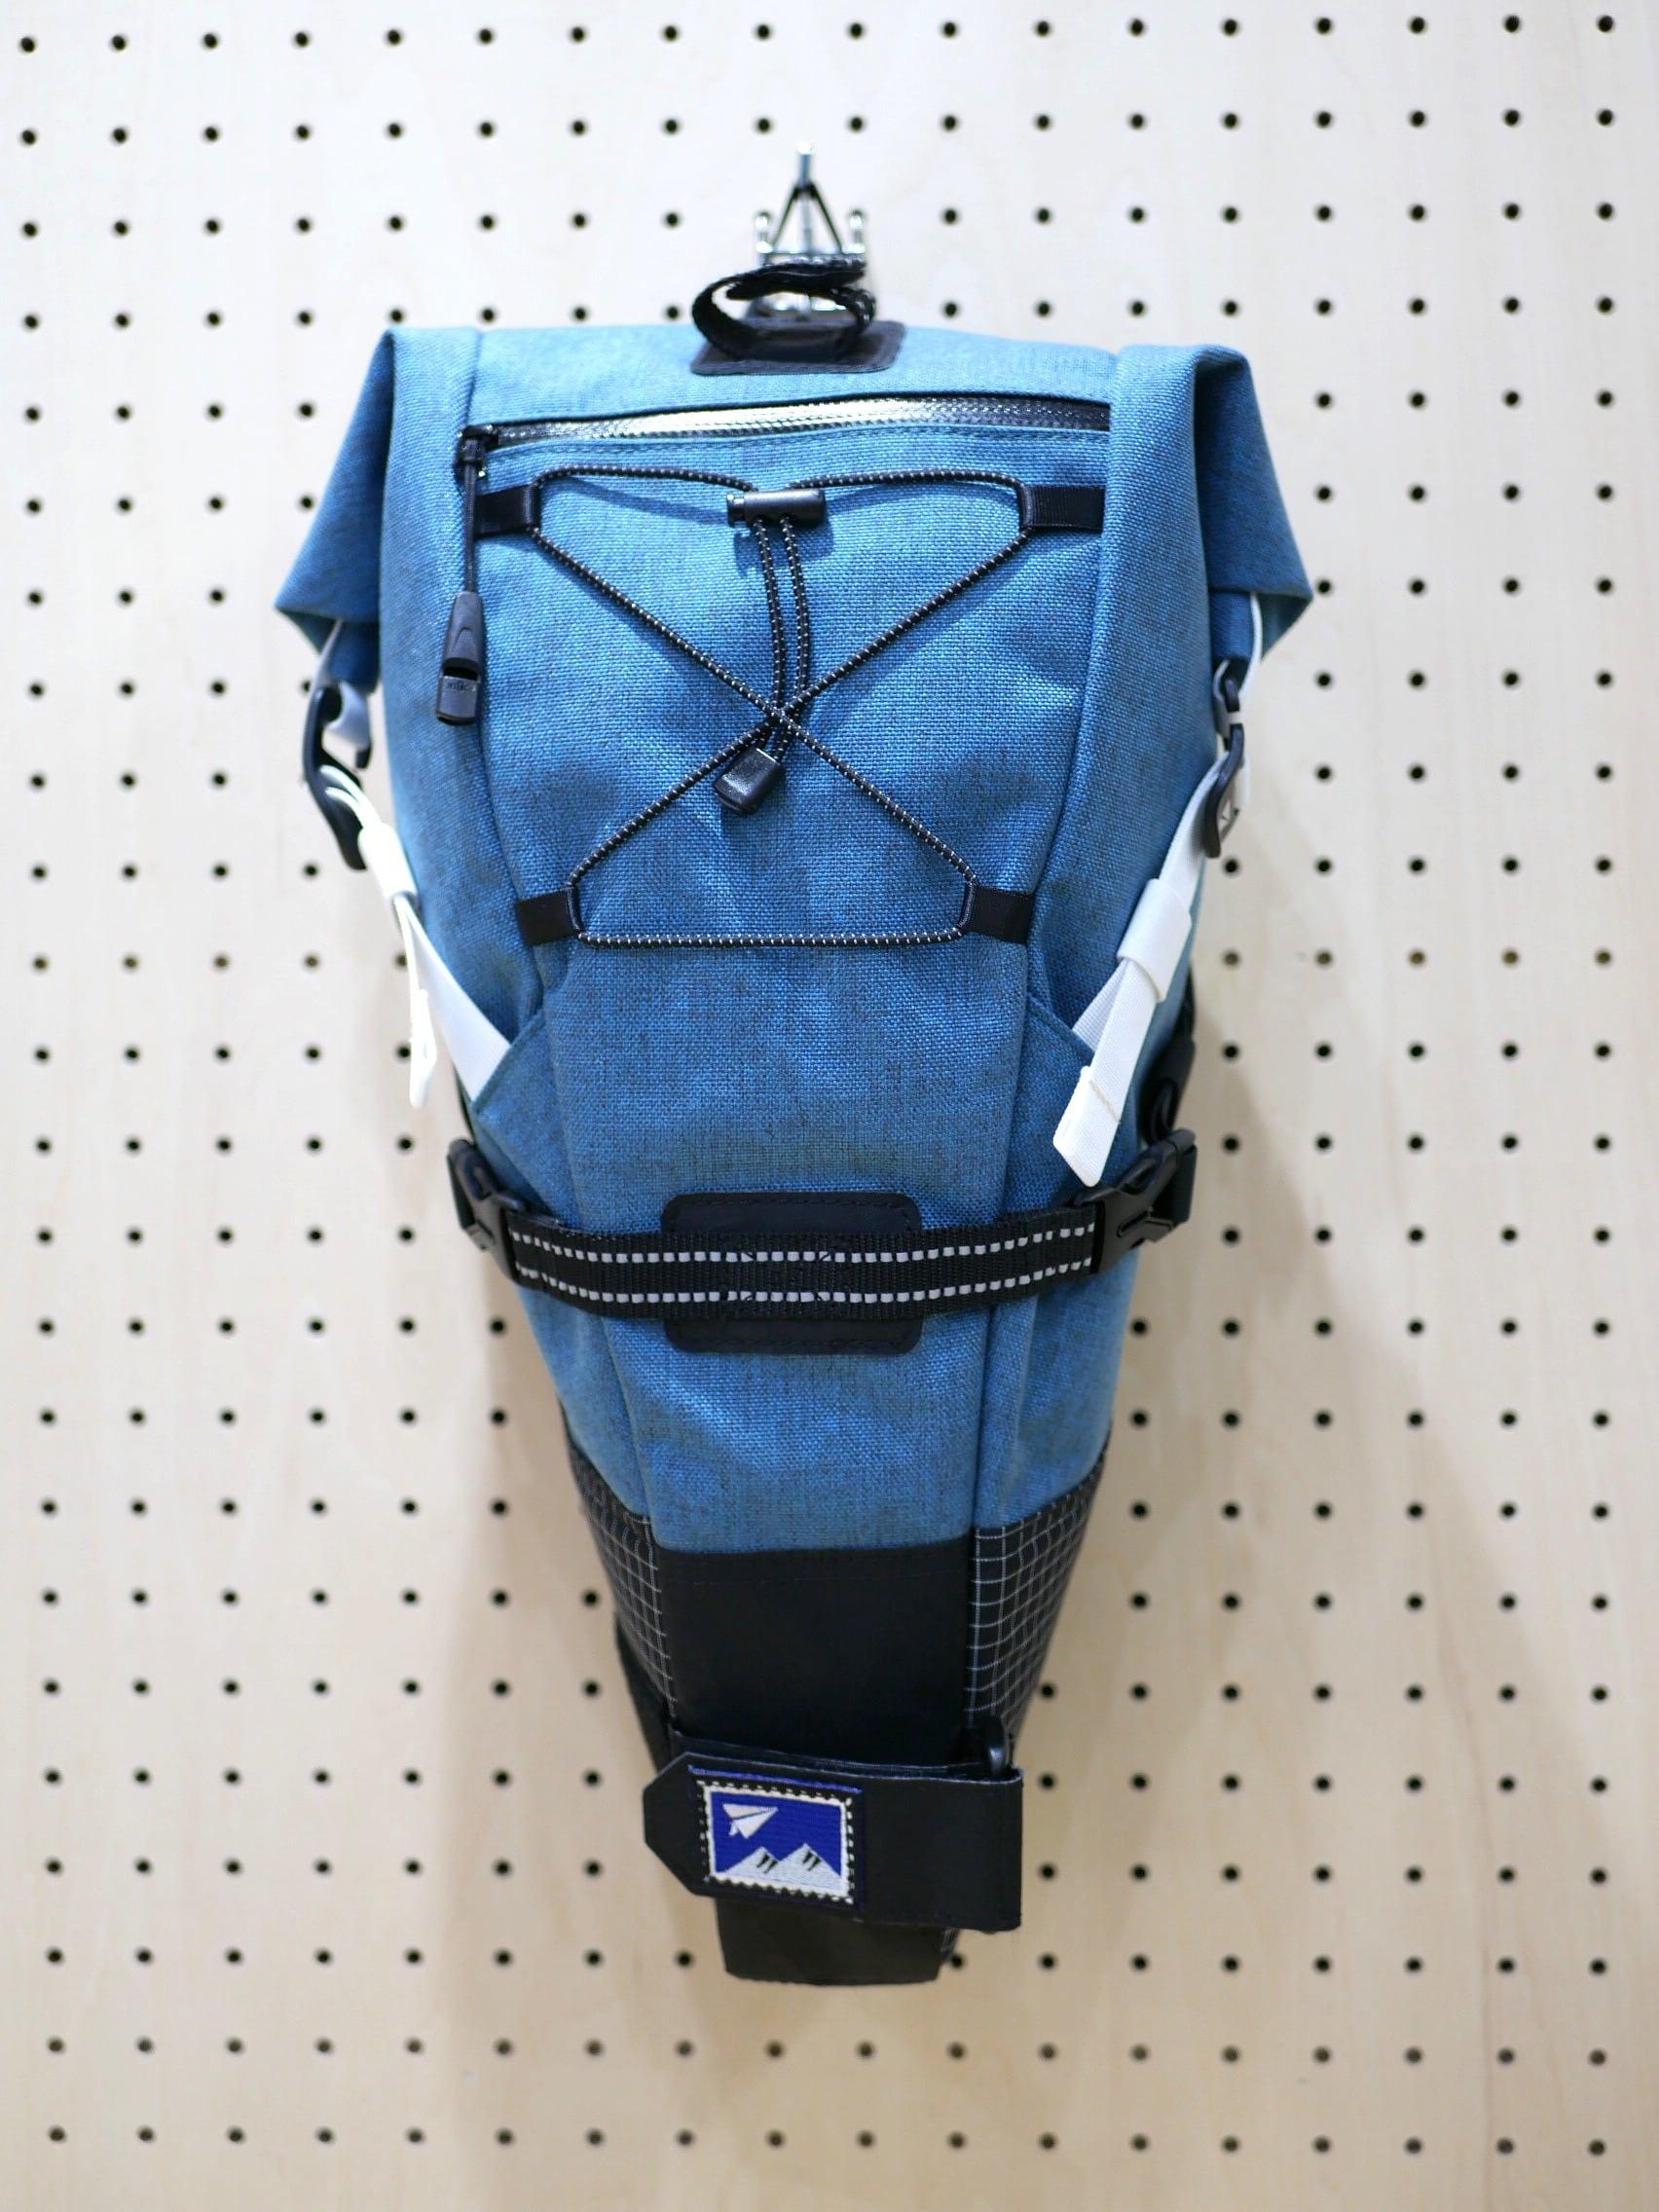 RAWLOW MOUNTAIN WORKS / BIKE'N HIKE BAG(PAPERSKY  ver)